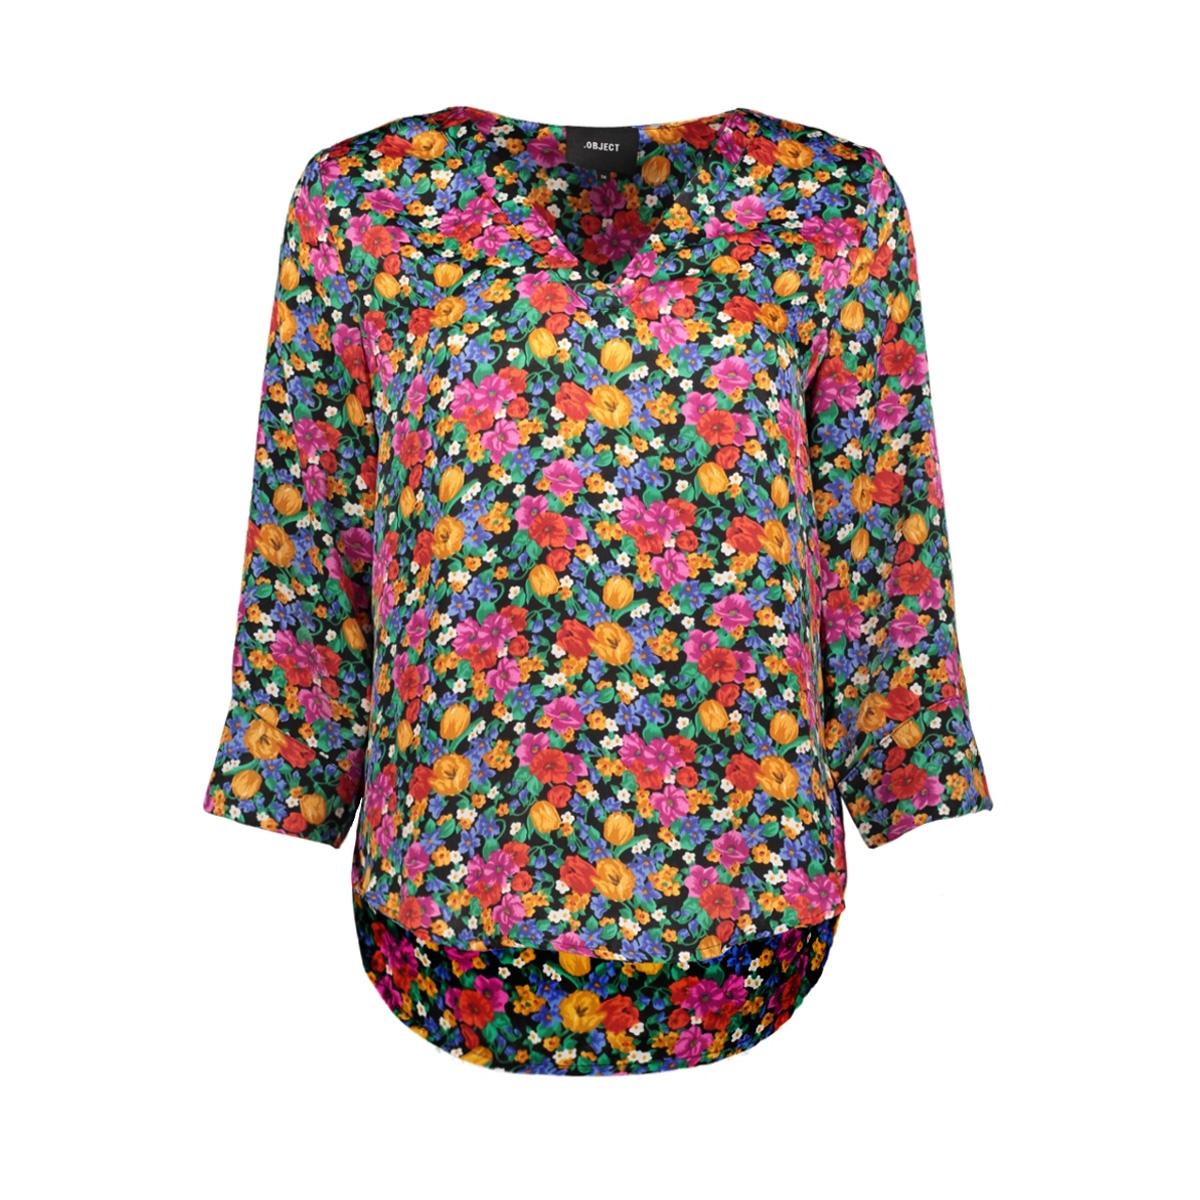 objvioletta bay 3/4 top 101 23029650 object t-shirt maize/flower aop